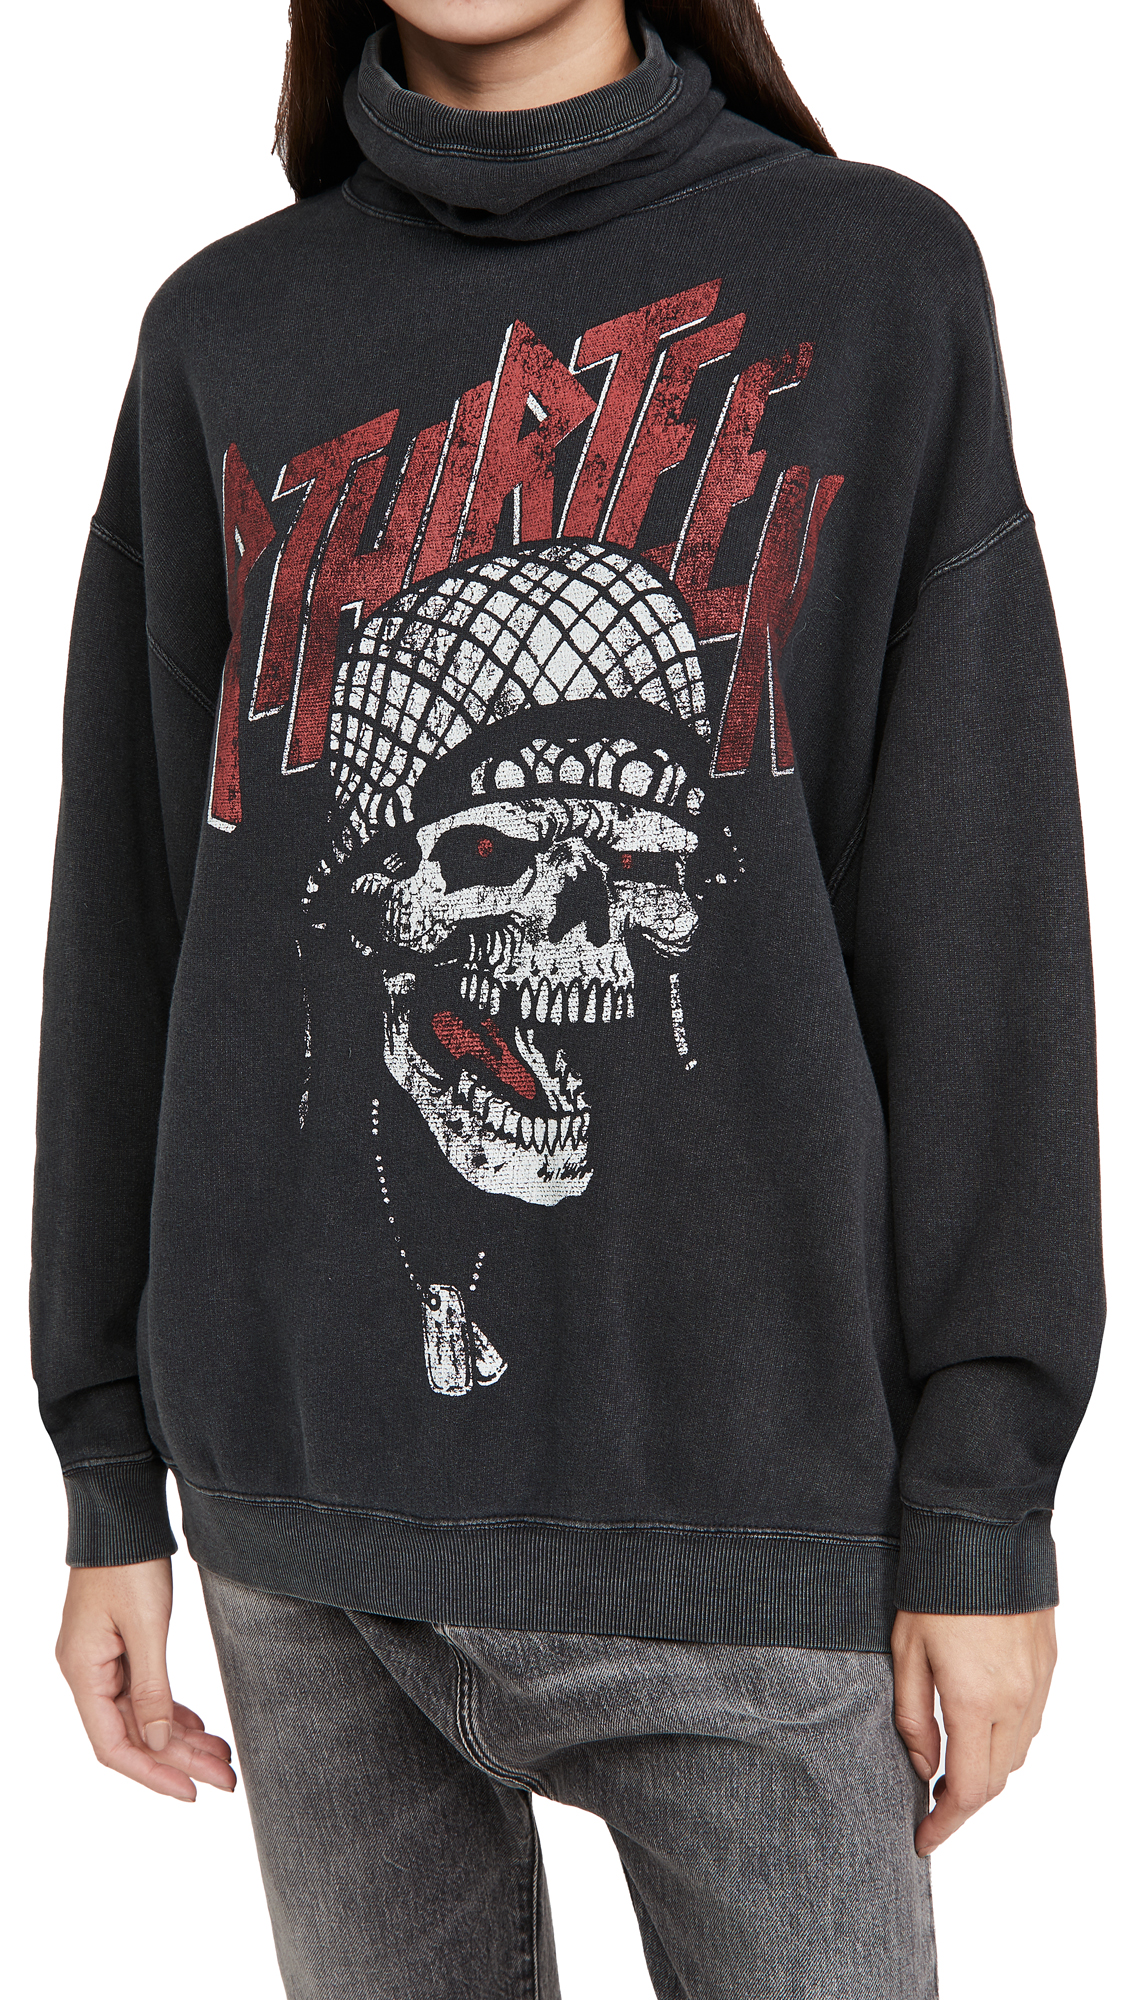 R13 #MaskUp Battle Punk Vintage Fleece Crew Sweatshirt